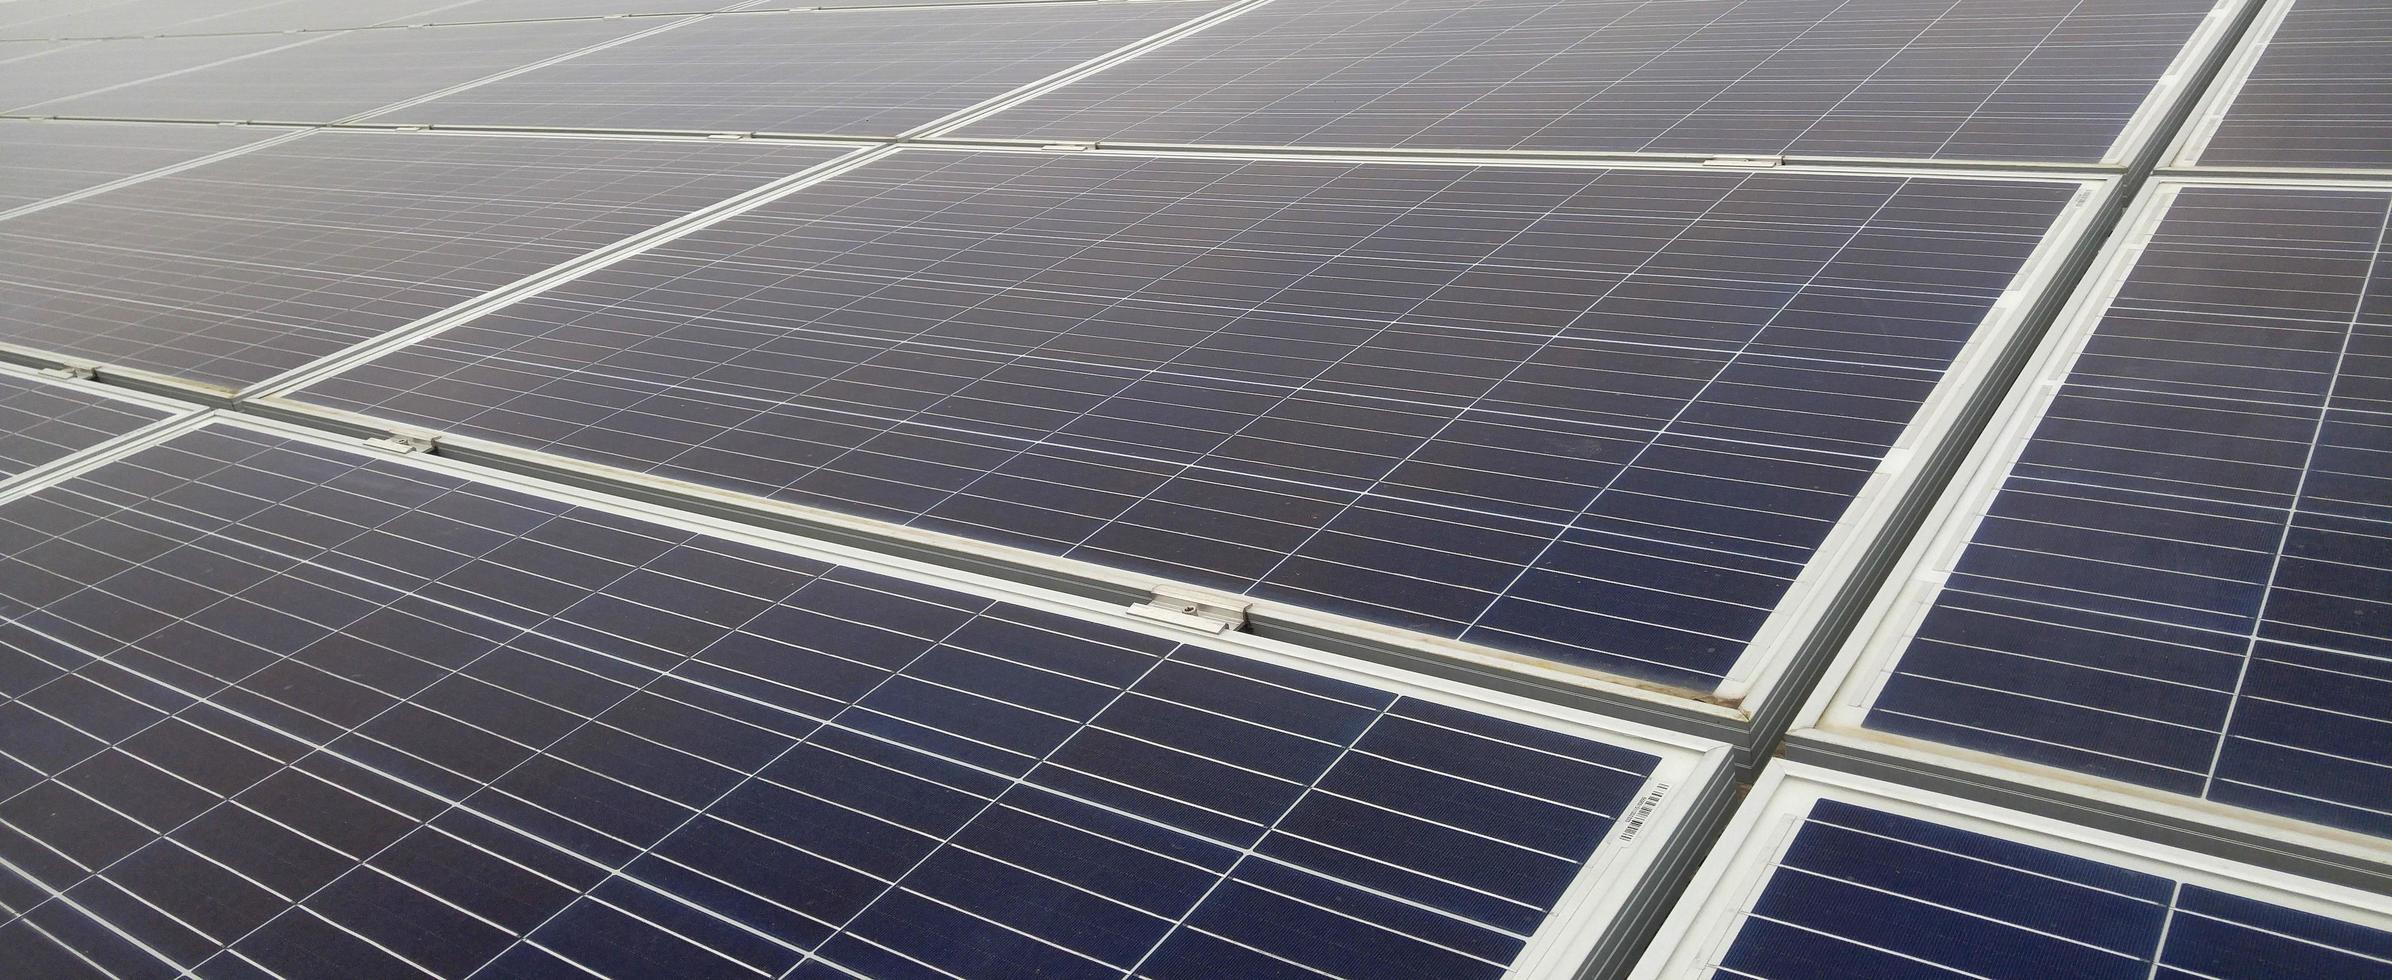 Solar modules closeup photo